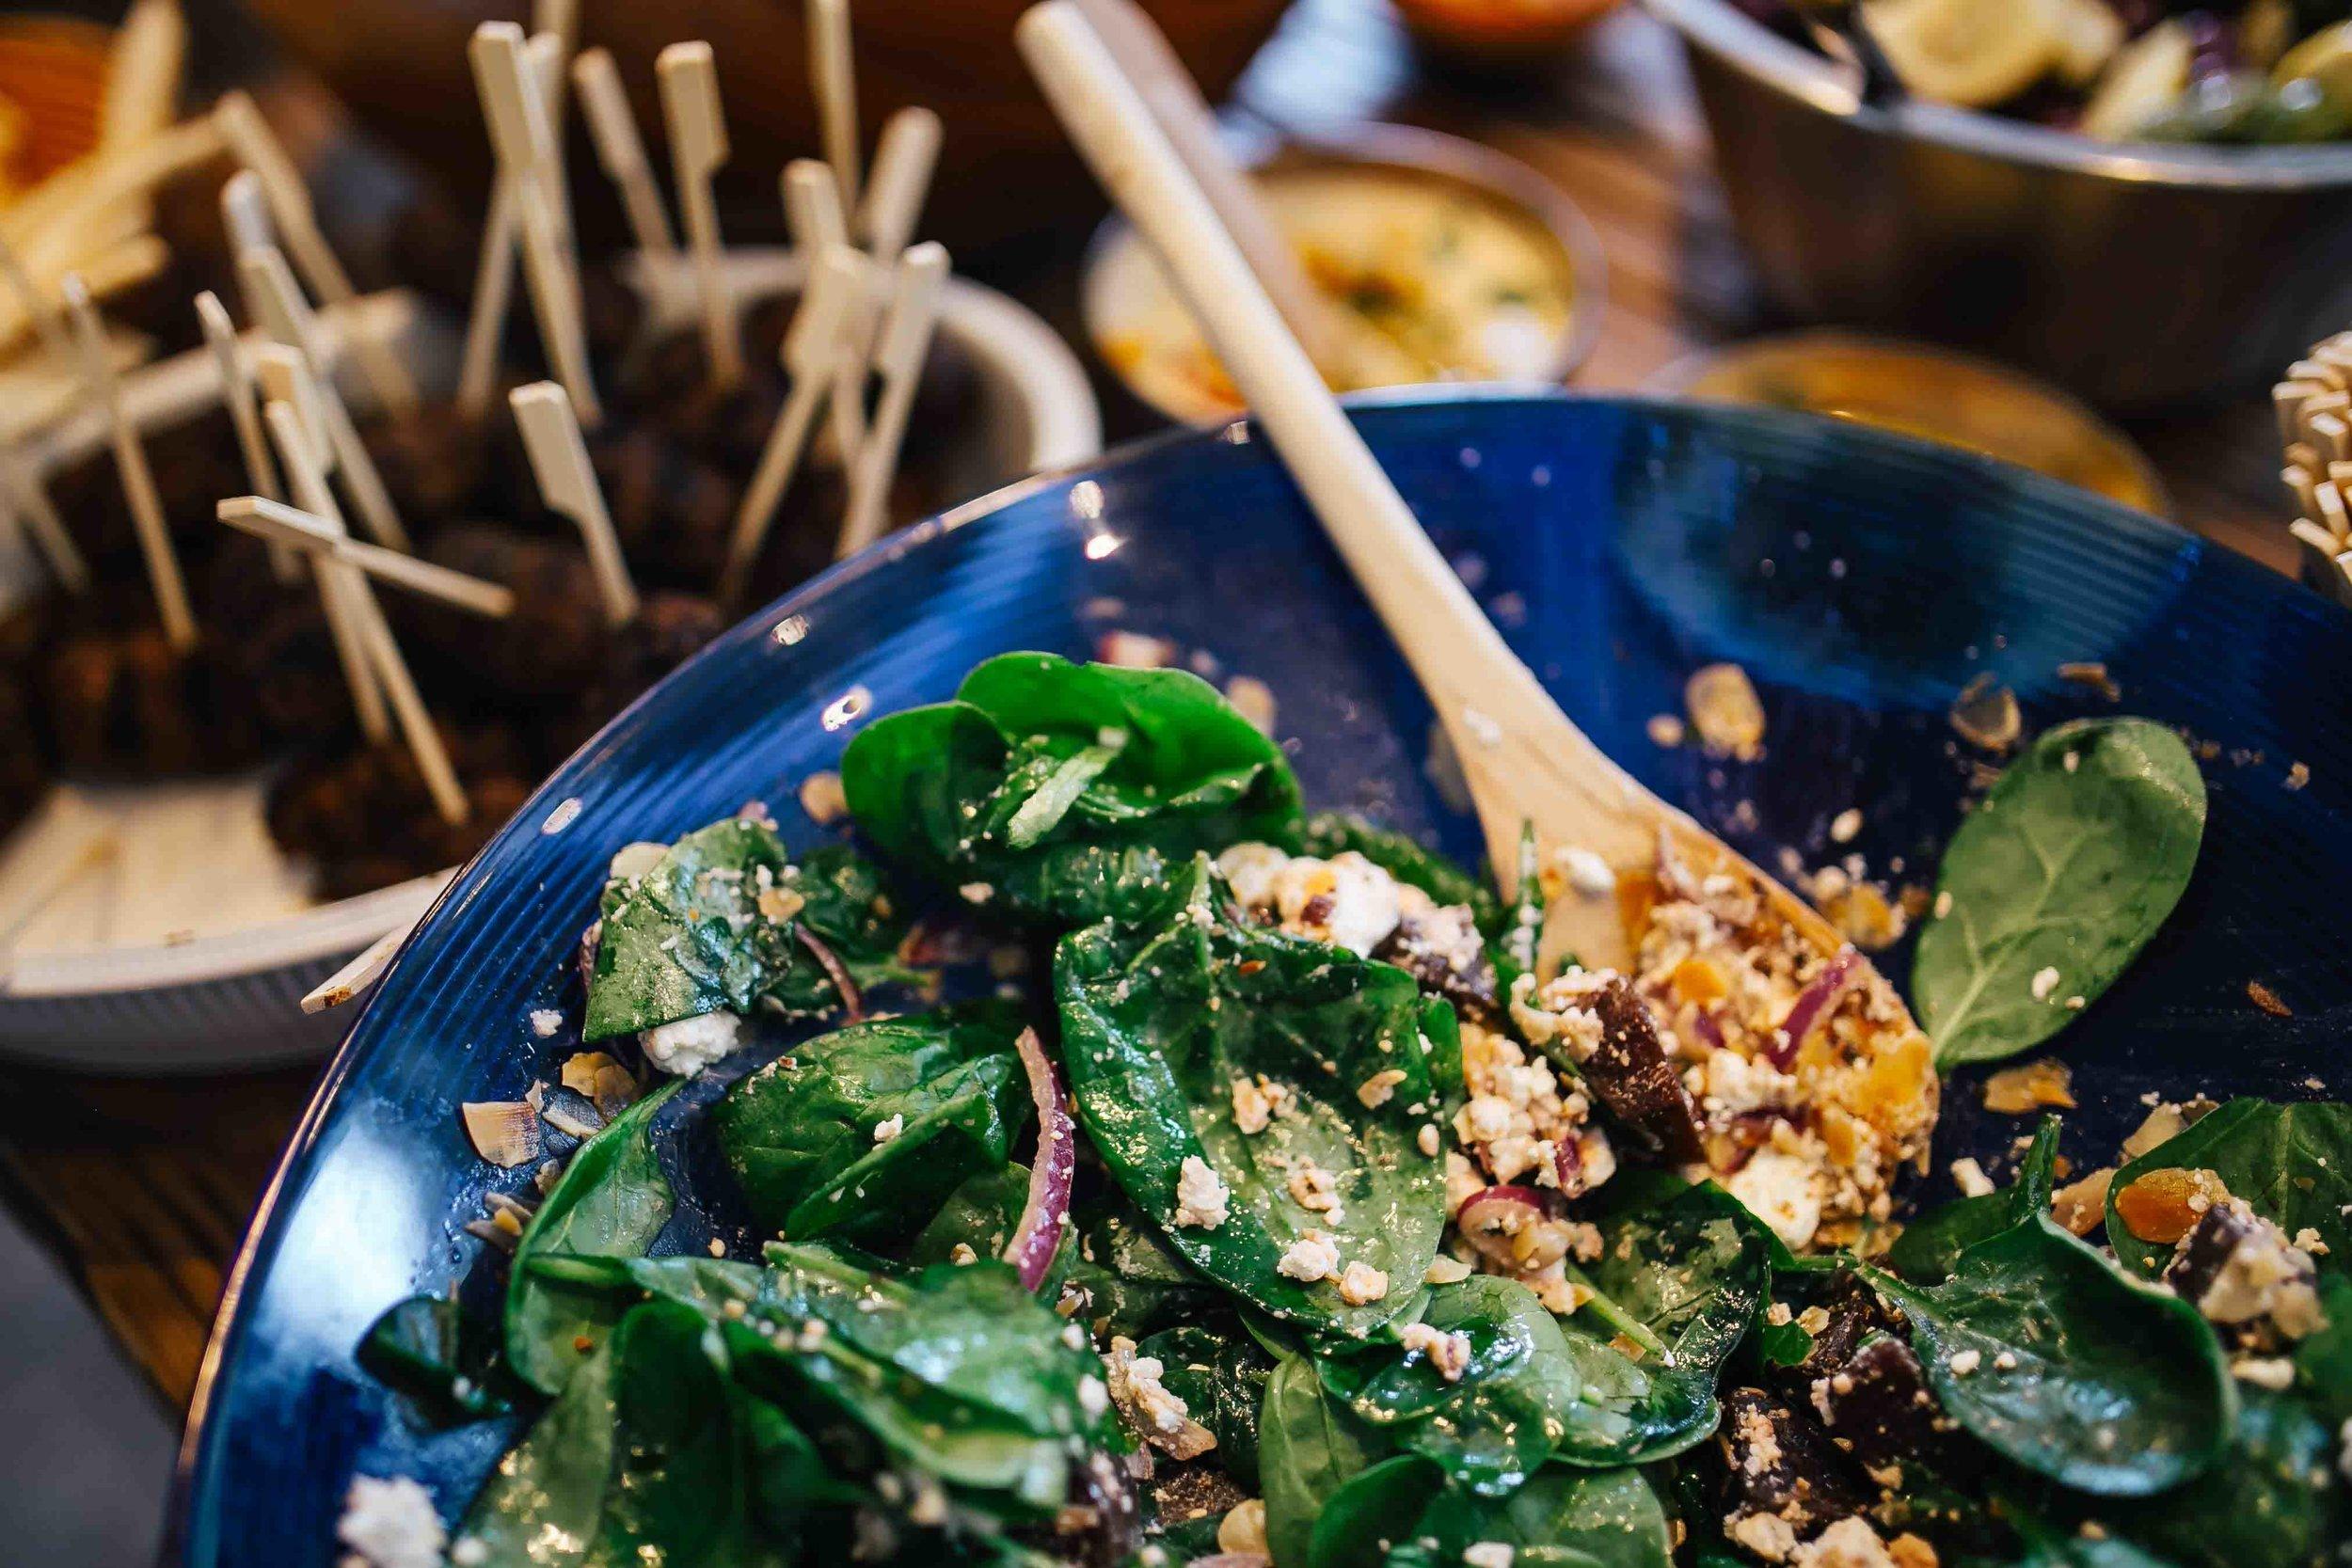 kaboompics_Salad with spinach.jpg